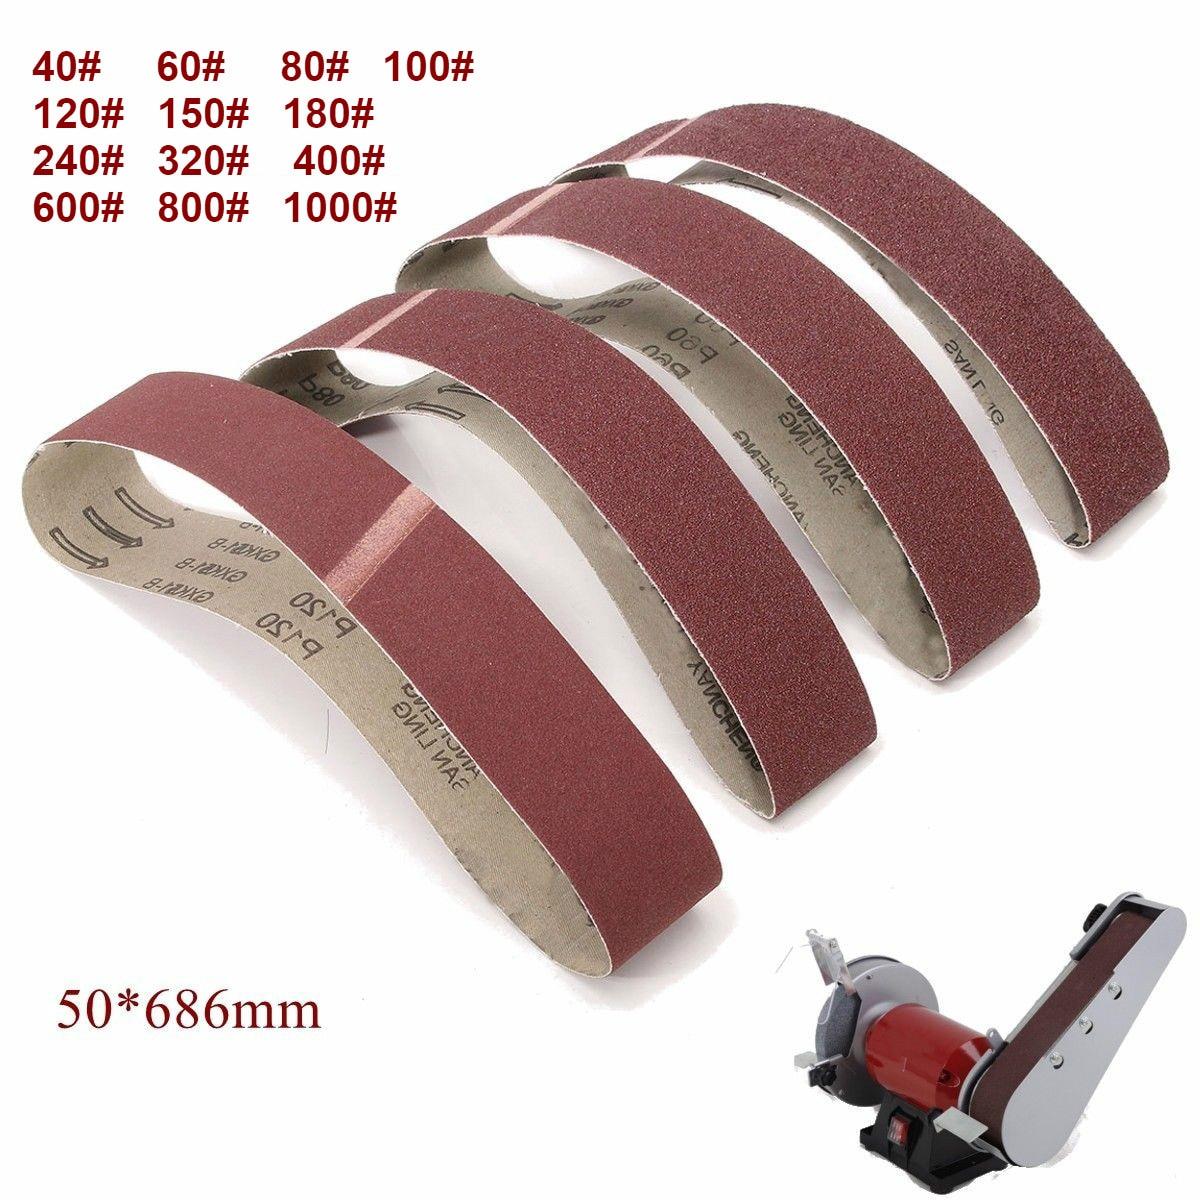 10pack 686 50mm Sanding Belts 40 1000 Grit Aluminium Oxide Sander Sanding Belts Polishing Machine Abrasive Tools Hot Price Eccc4 Cicig